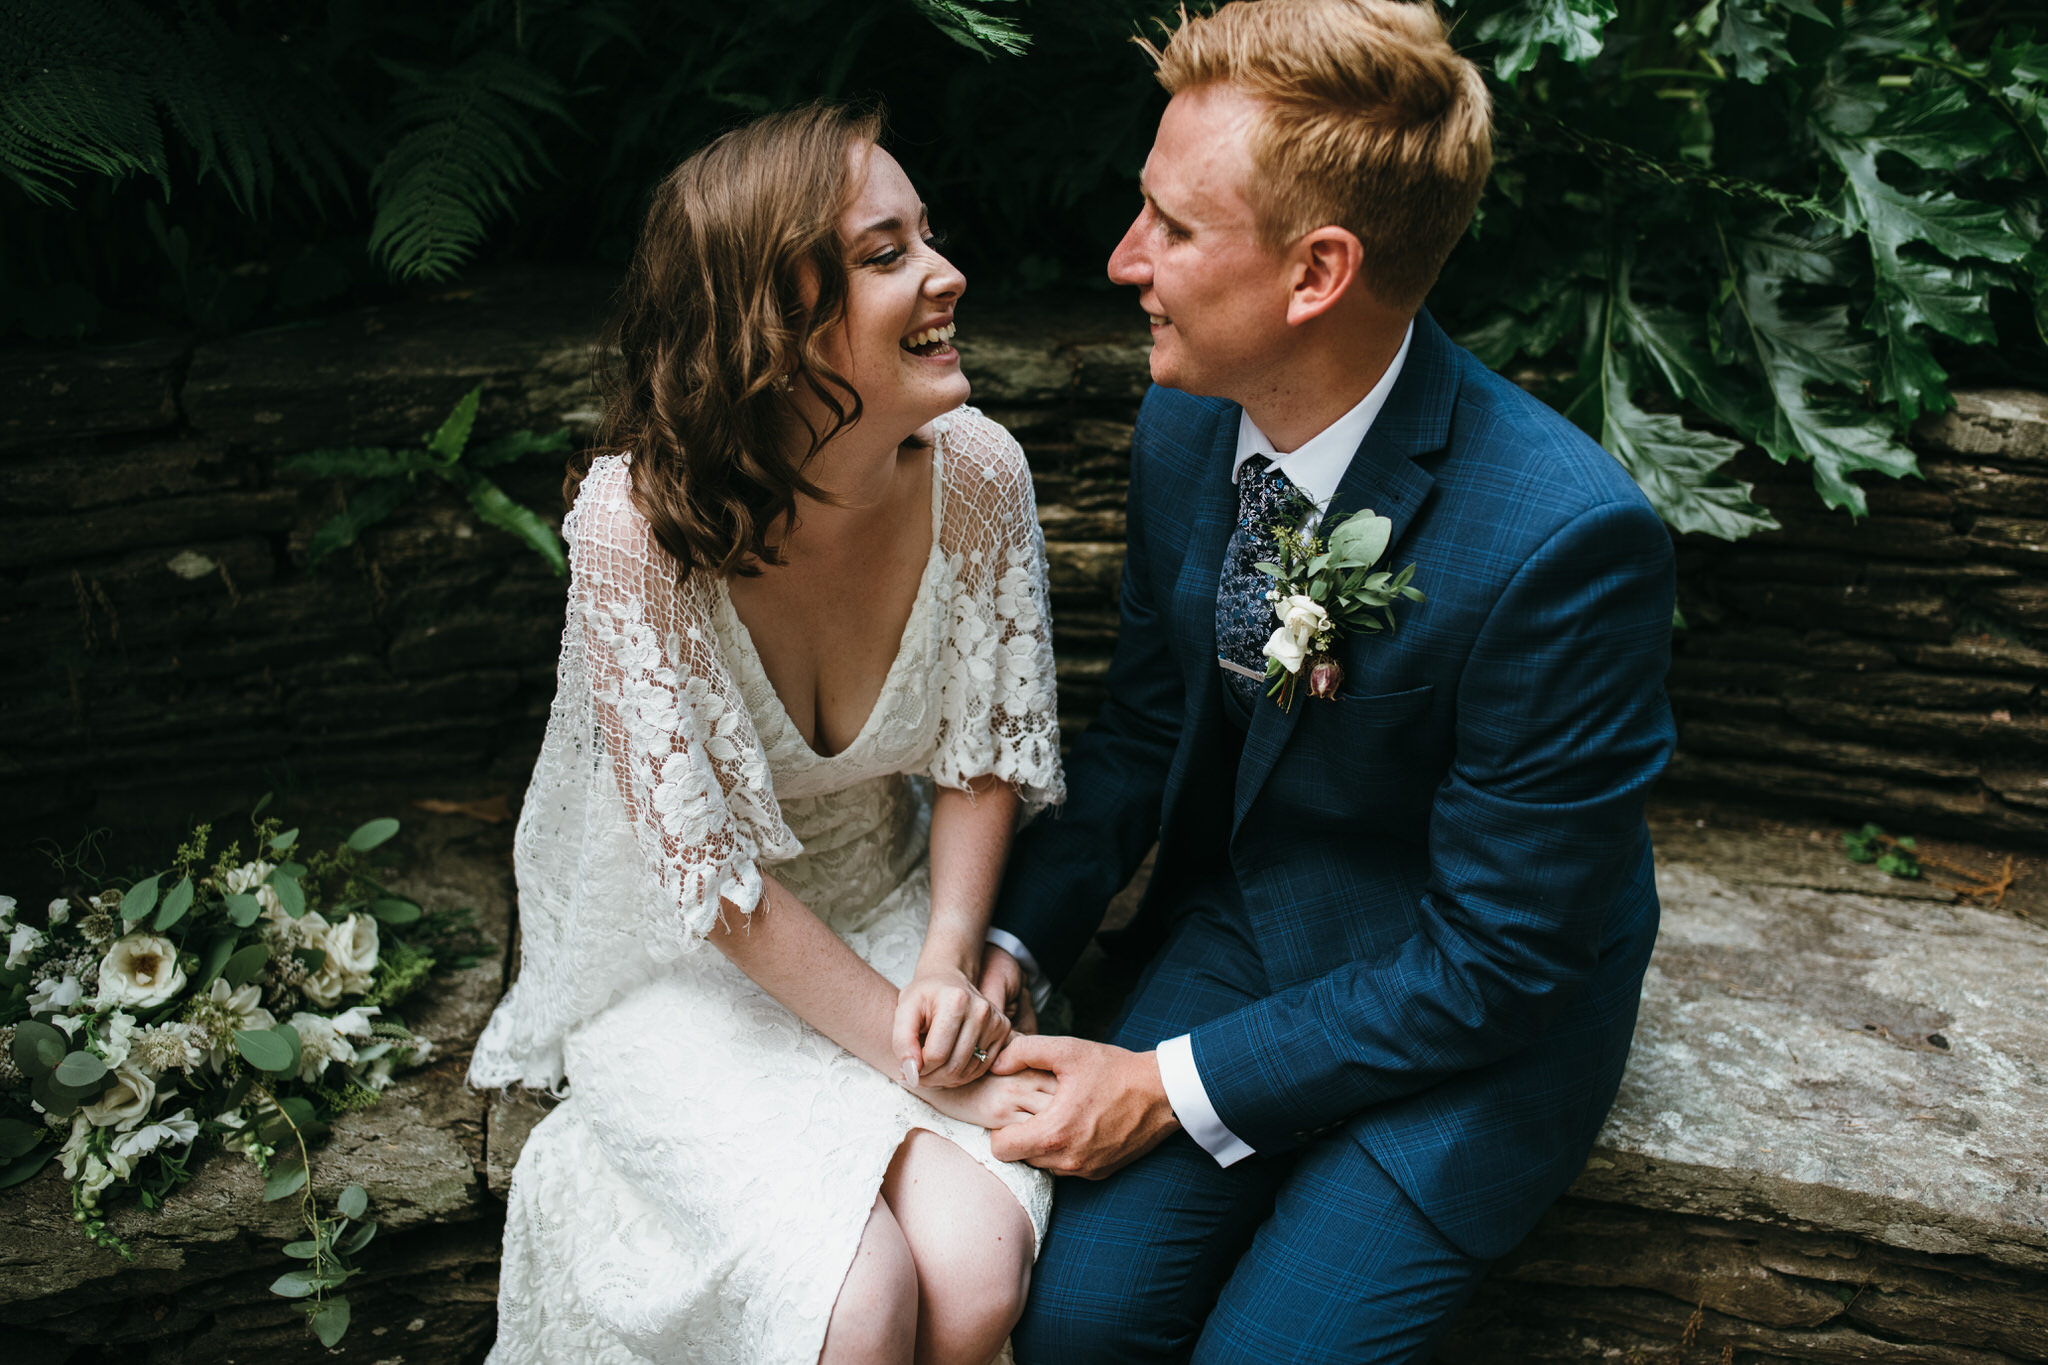 Newlyweds at Hestercombe Gardens